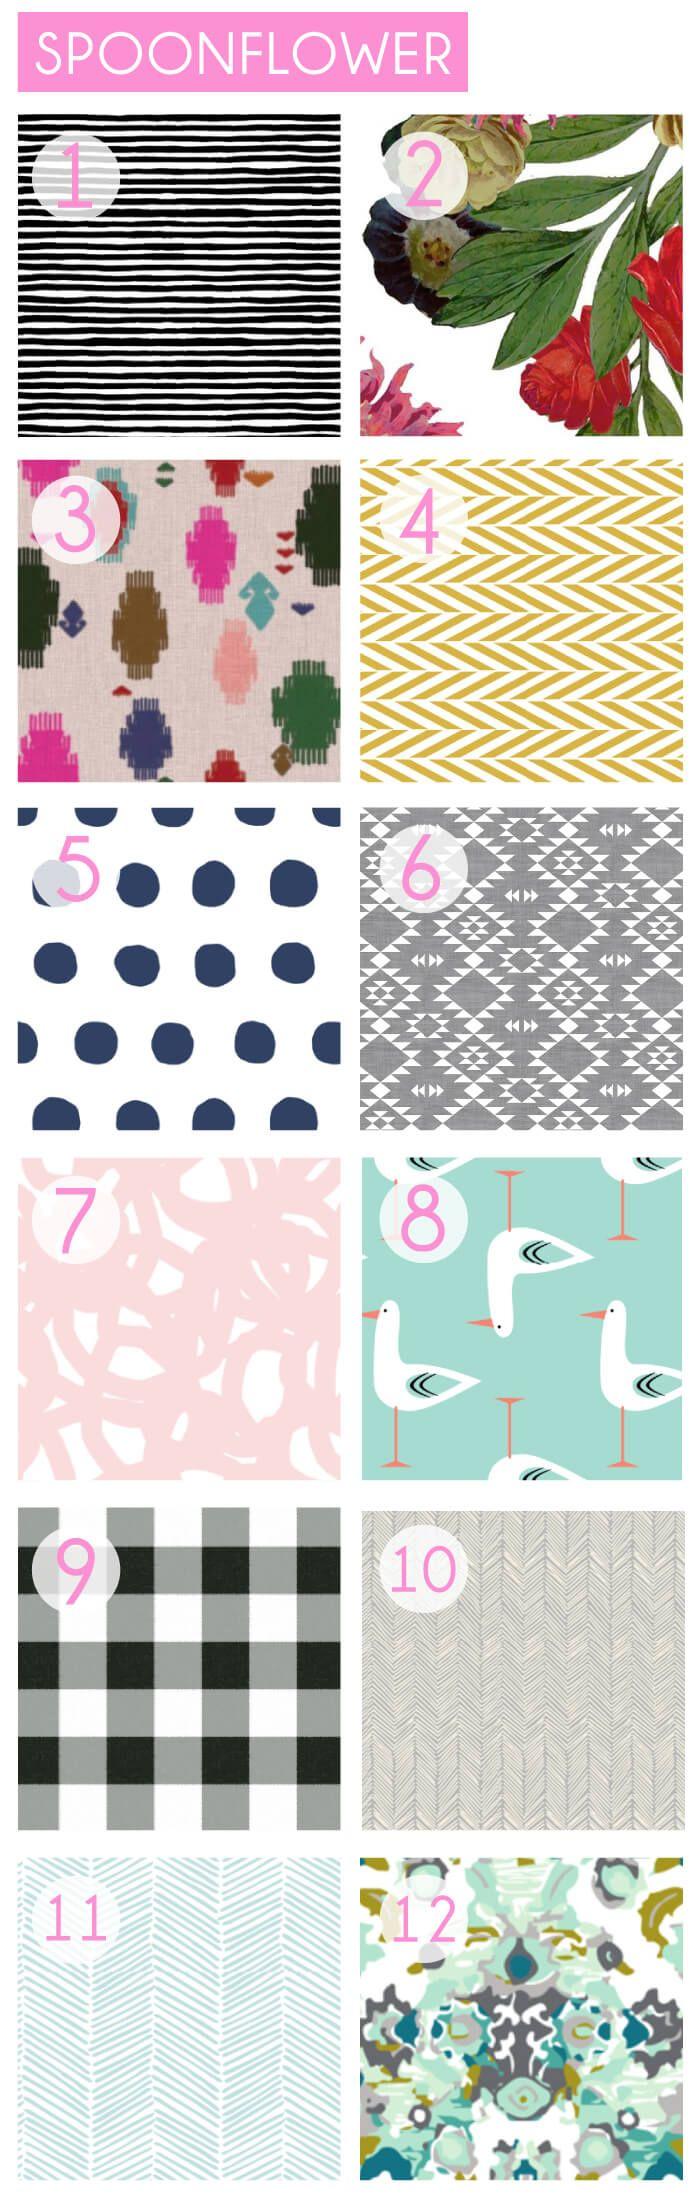 Best Online Fabric Stores - Emily Henderson